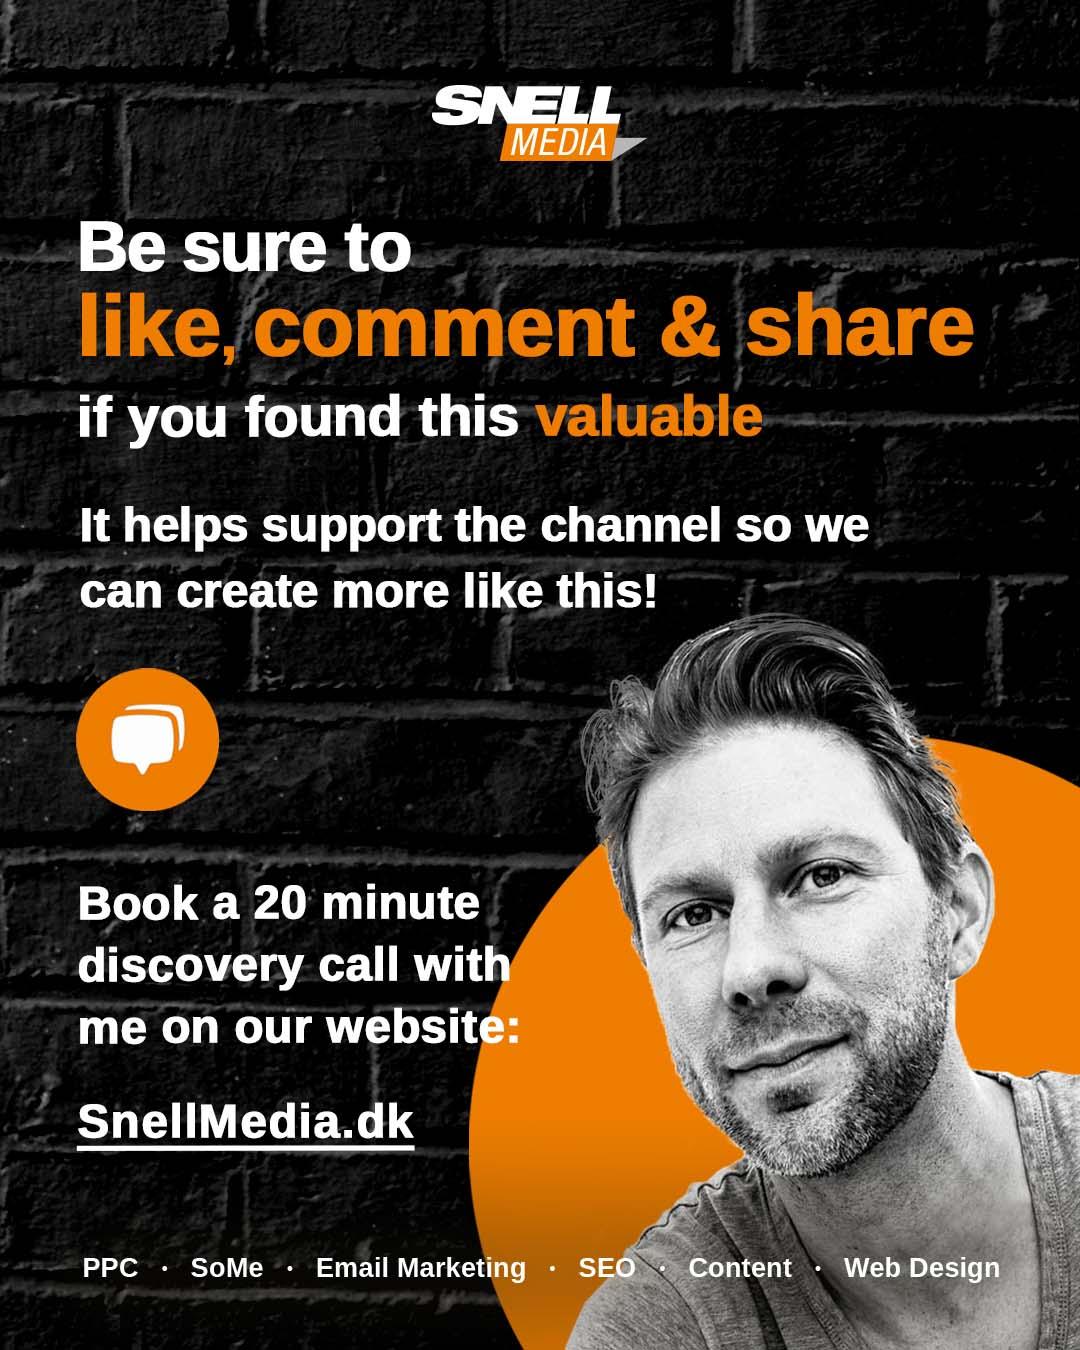 Digital Marketing Agency SnellMedia